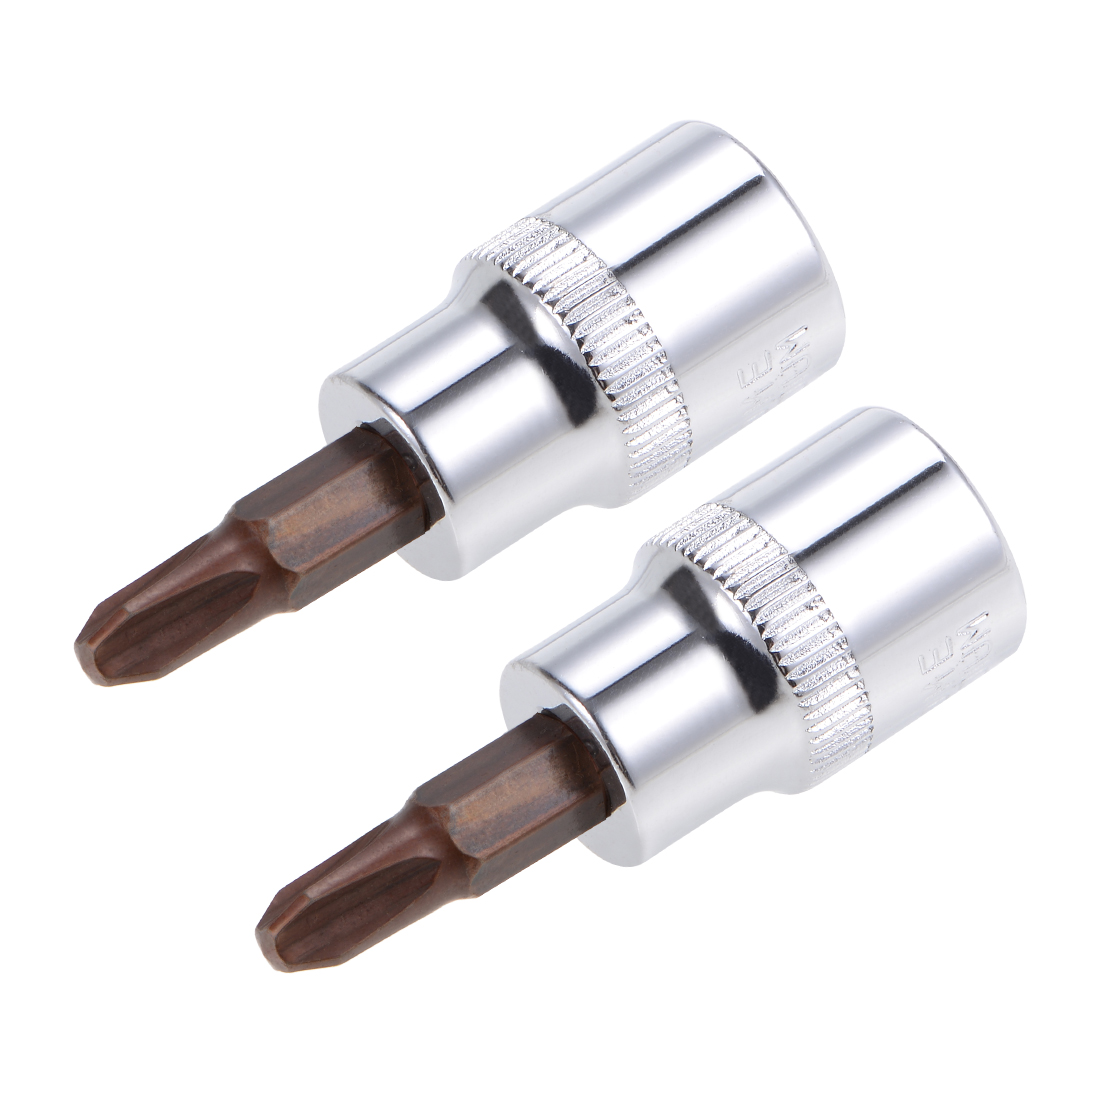 "2 Pcs 3/8"" Drive x #3 Phillips Bit Socket, Standard Metric, S2 and Cr-V Steel"